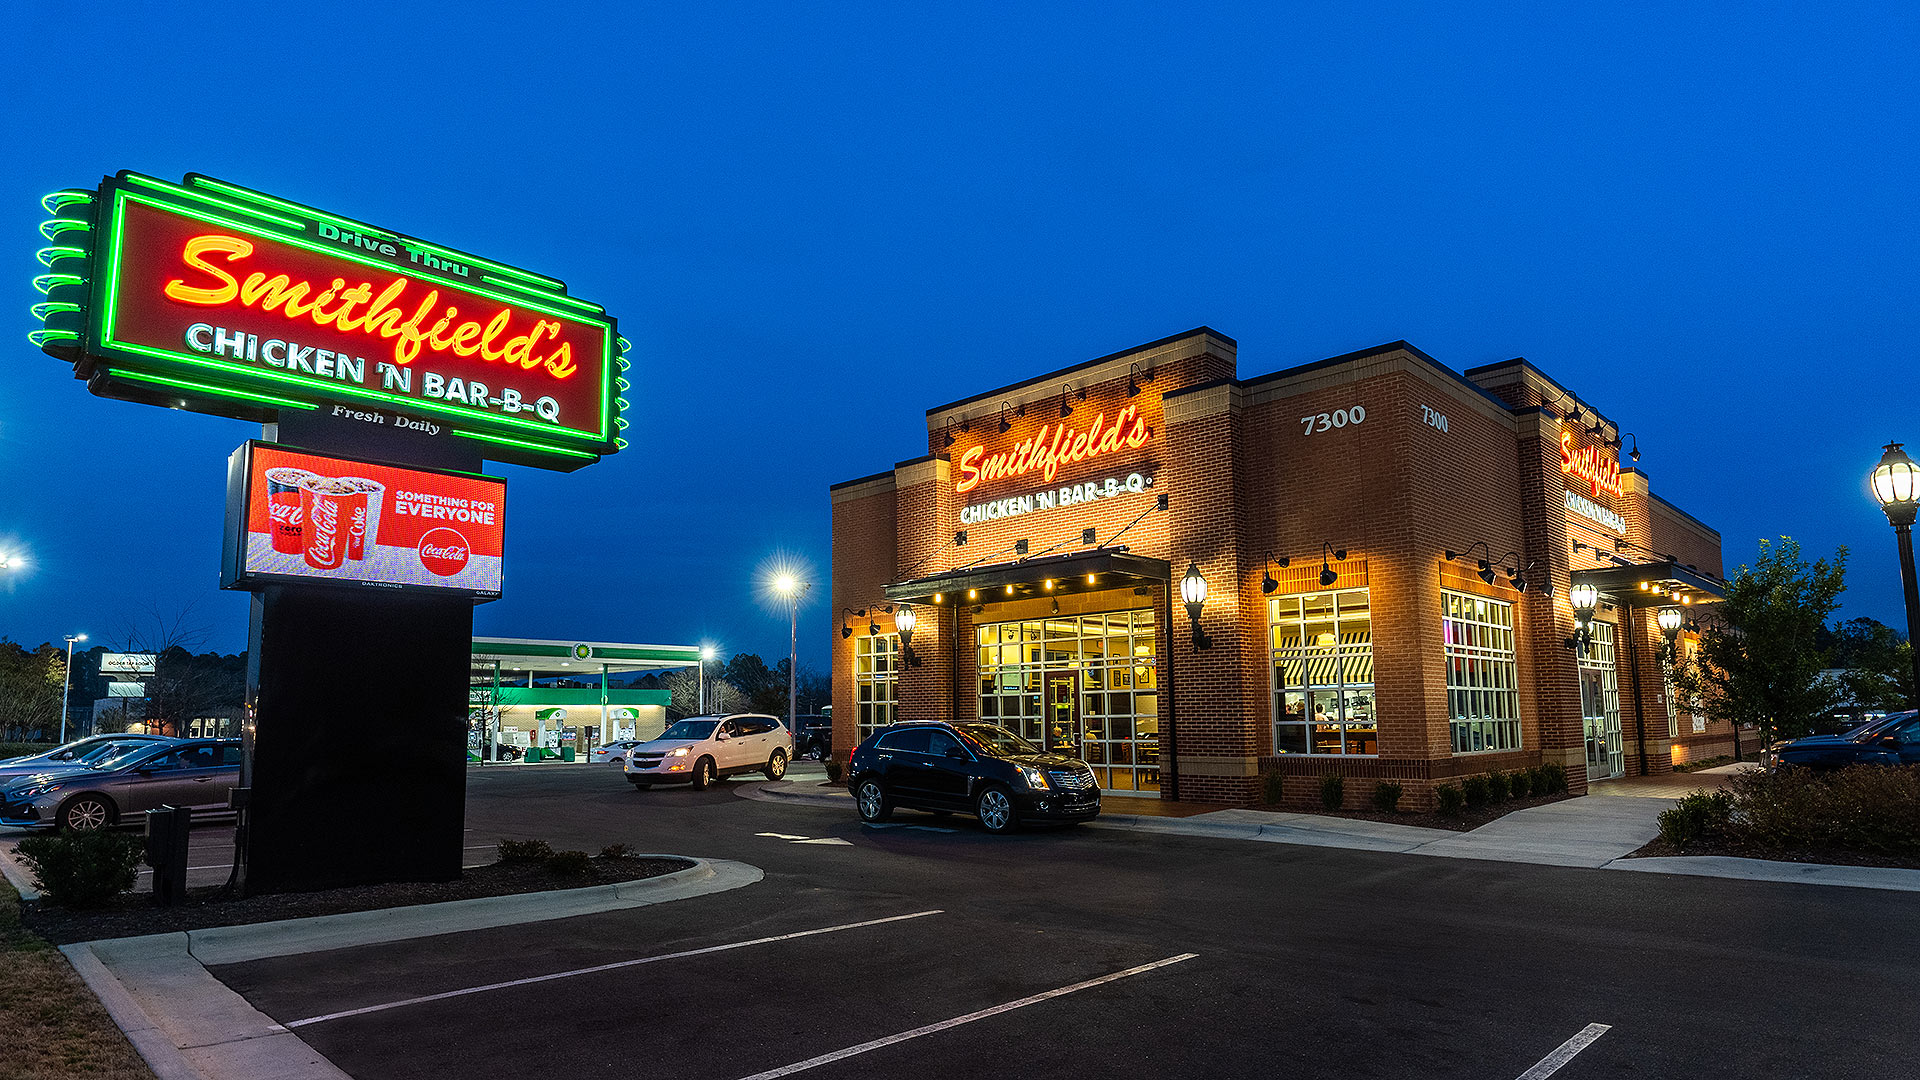 Smithfield's Chicken and BBQ